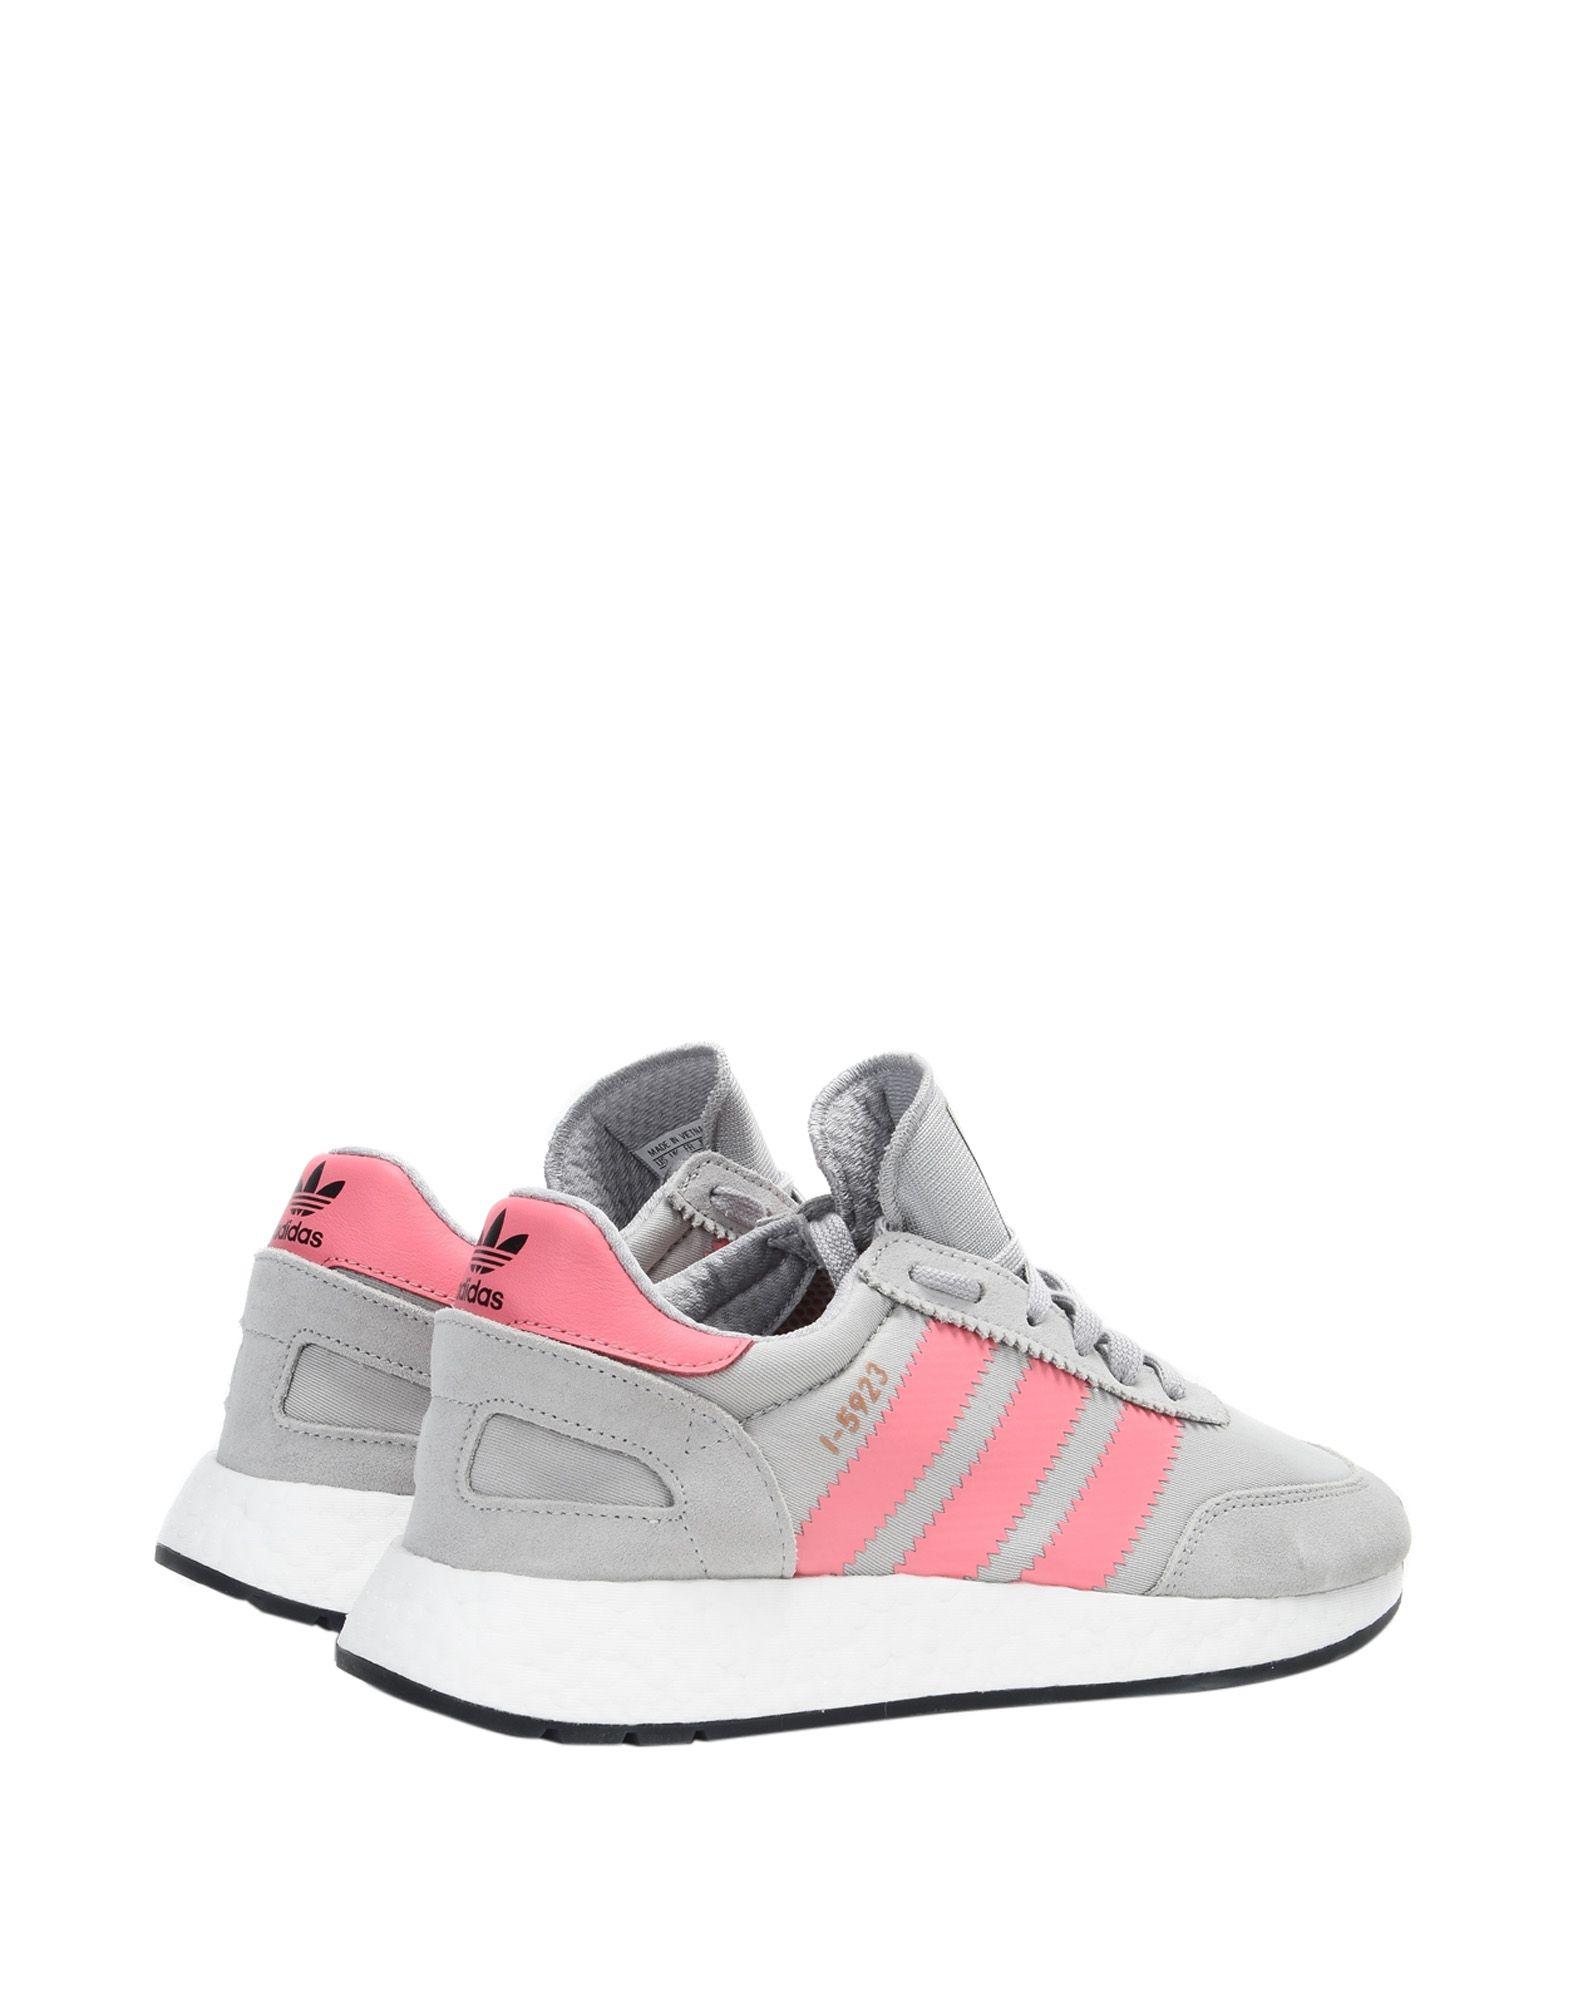 Stilvolle billige 11472072HE Schuhe Adidas Originals I 11472072HE billige d0b14f